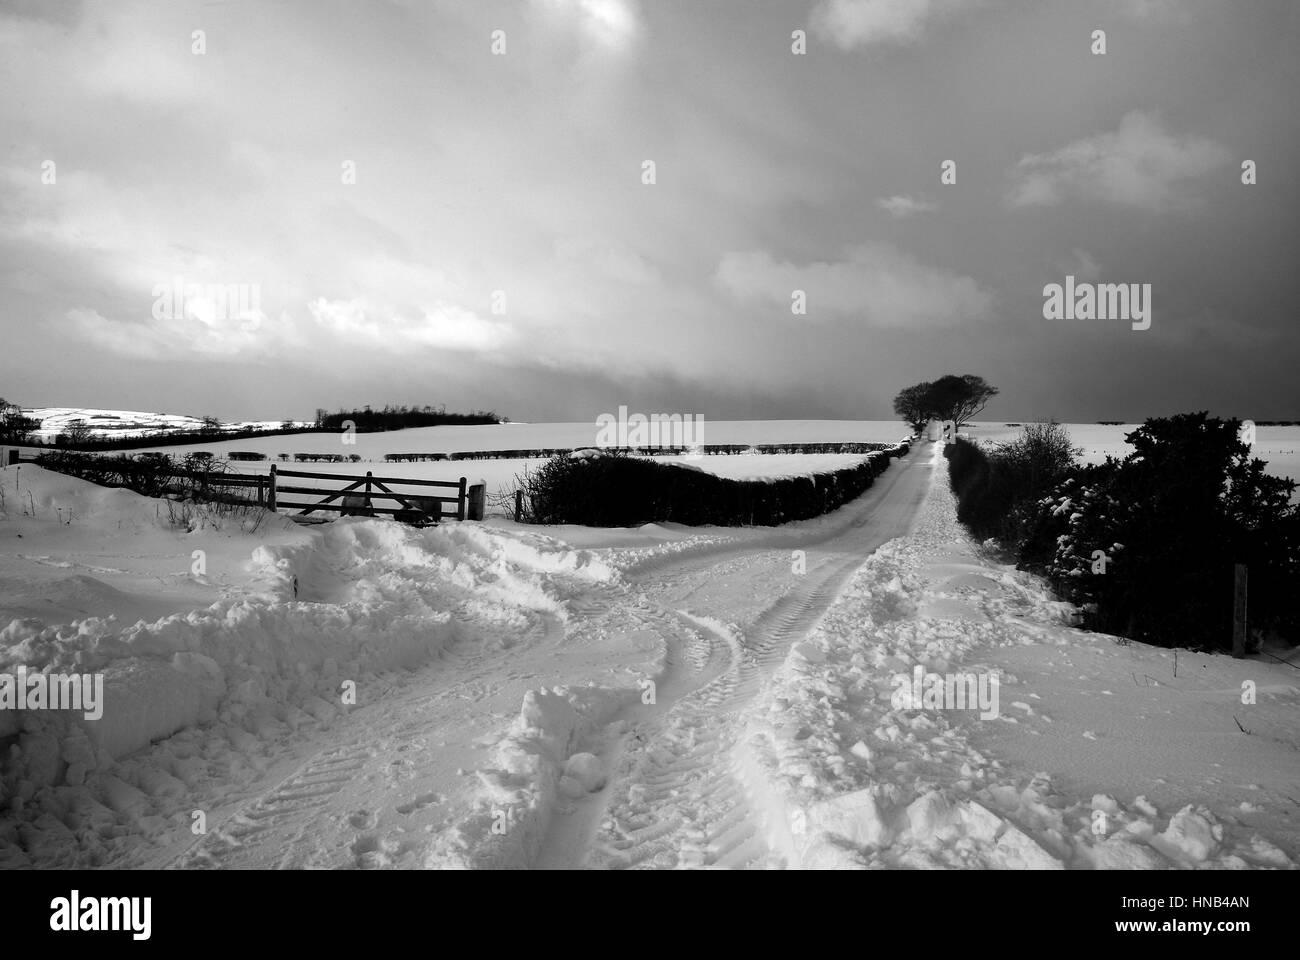 Black and White Landscape - heavy snowfall in Berwickshire, Scotland - Stock Image